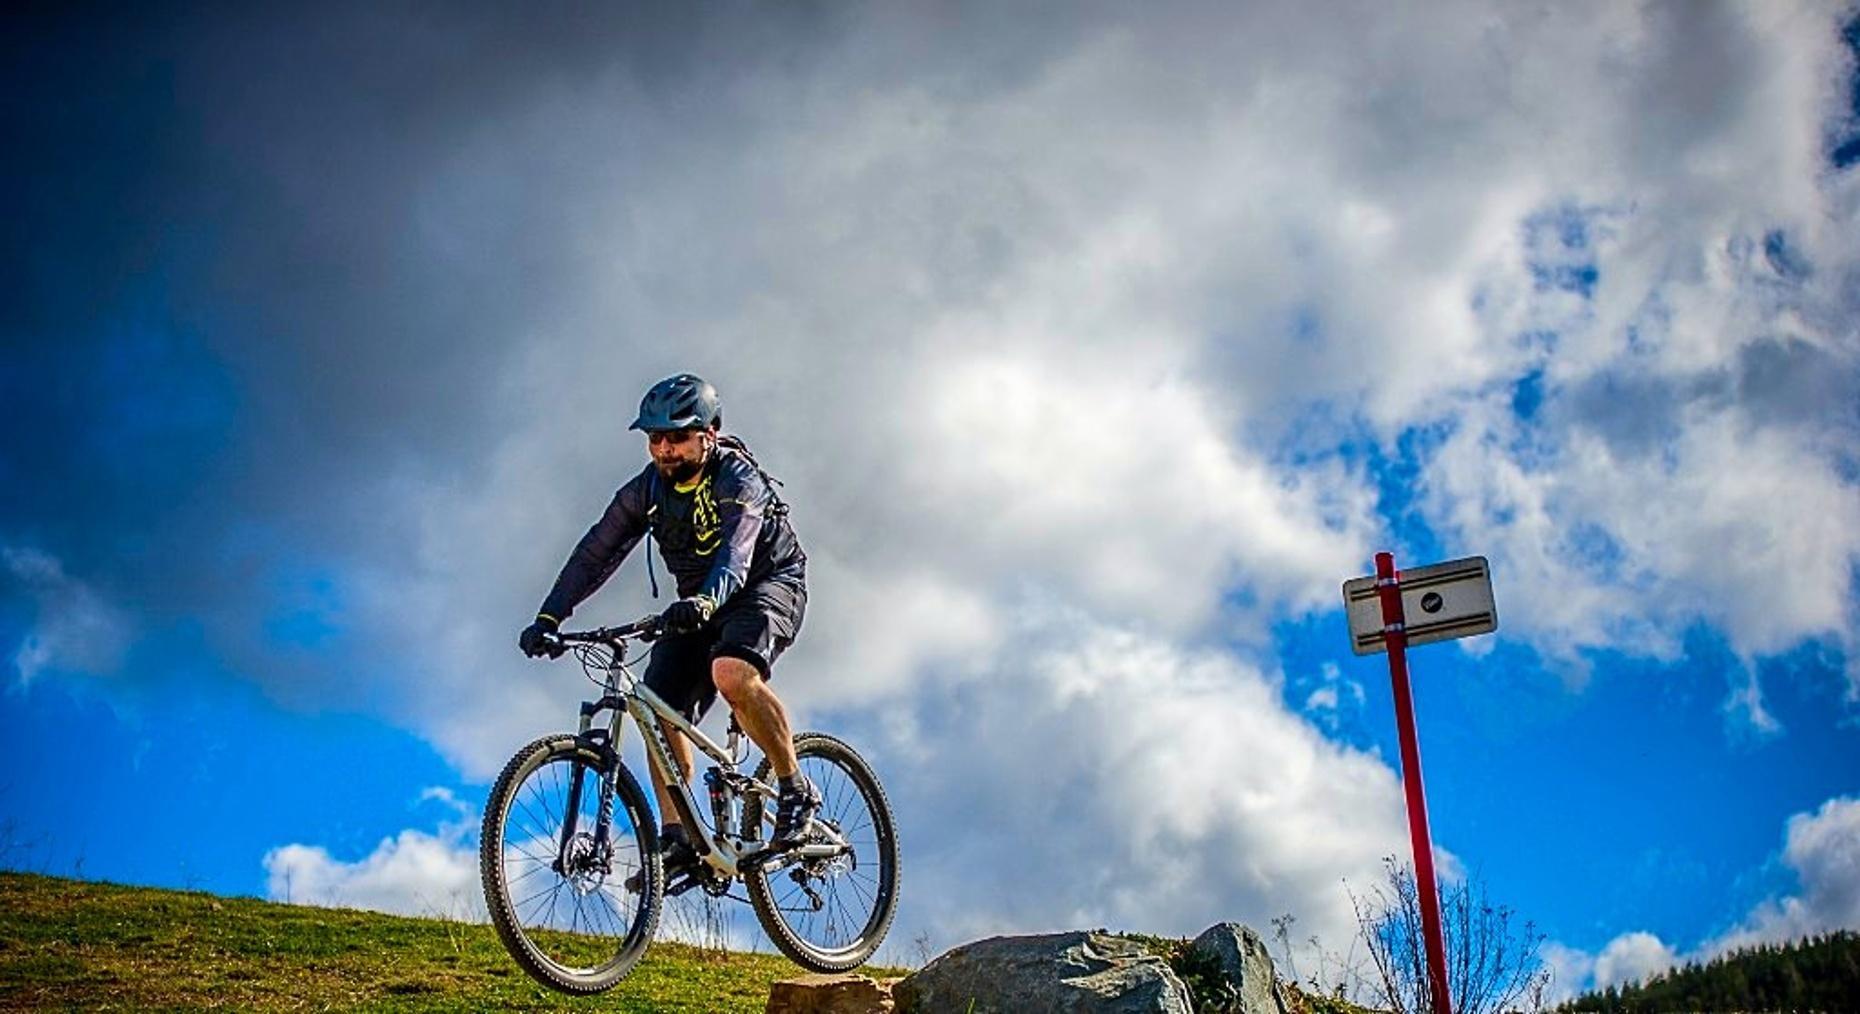 Santa Cruz Hightower Medium Bike Rental in Truckee